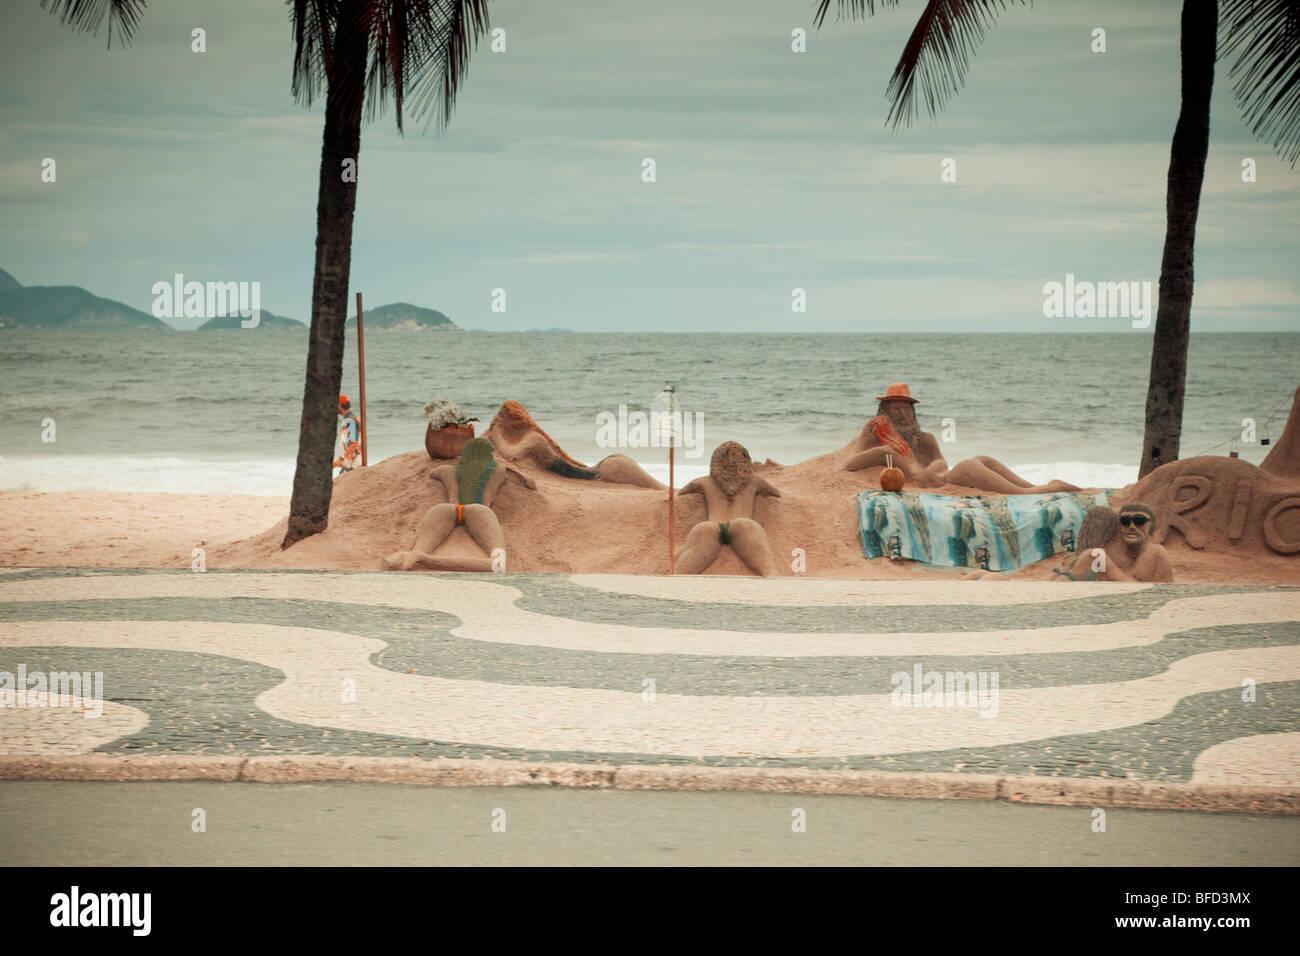 Strand Skulpturen Copacabana Rio De Janeiro Brasilien Stockfoto